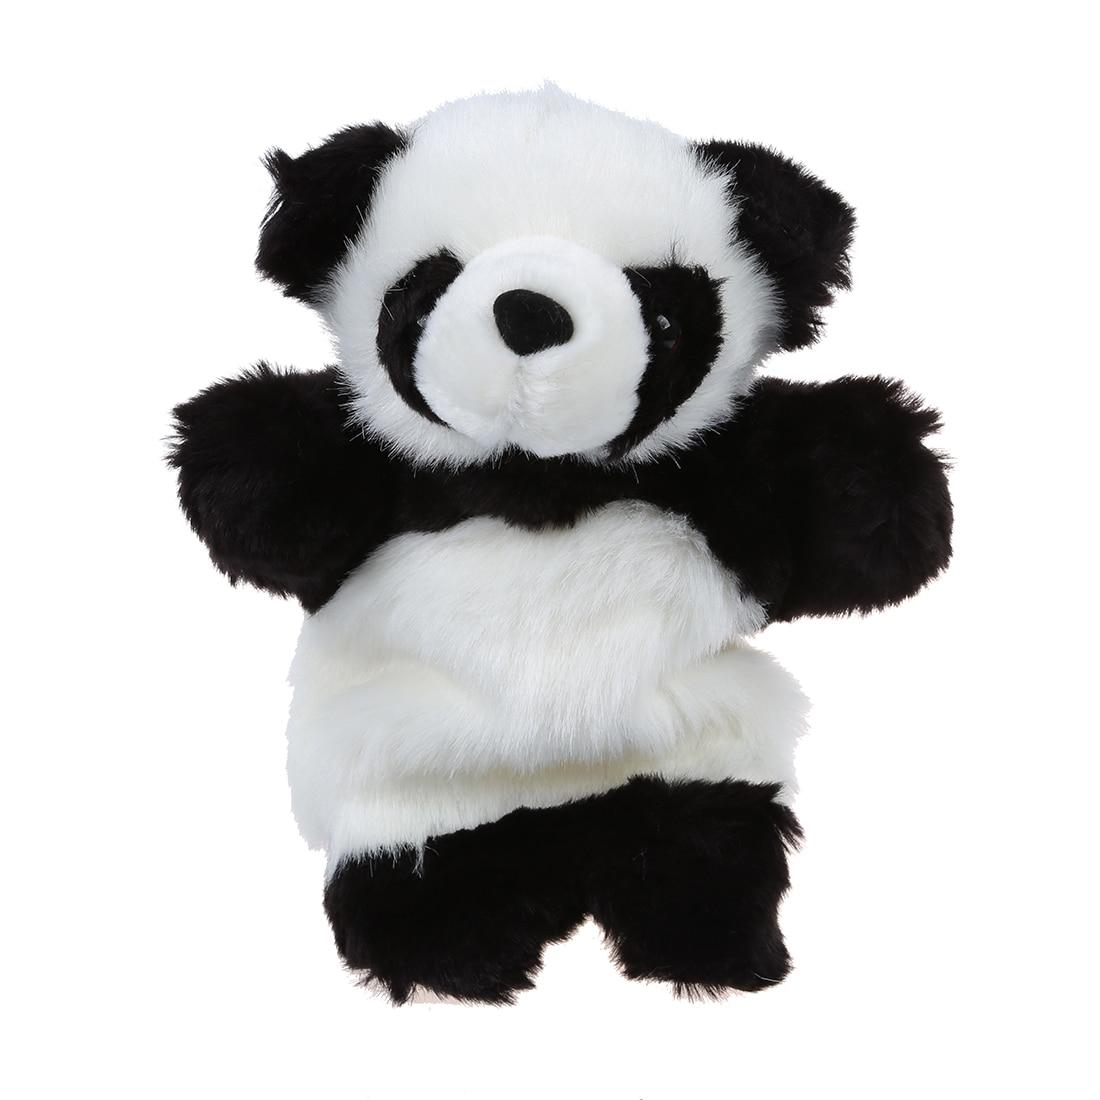 ABWE Cute Panda Wildlife Hand Glove Puppet Soft Plush Puppets Kid Childrens Toy Gift